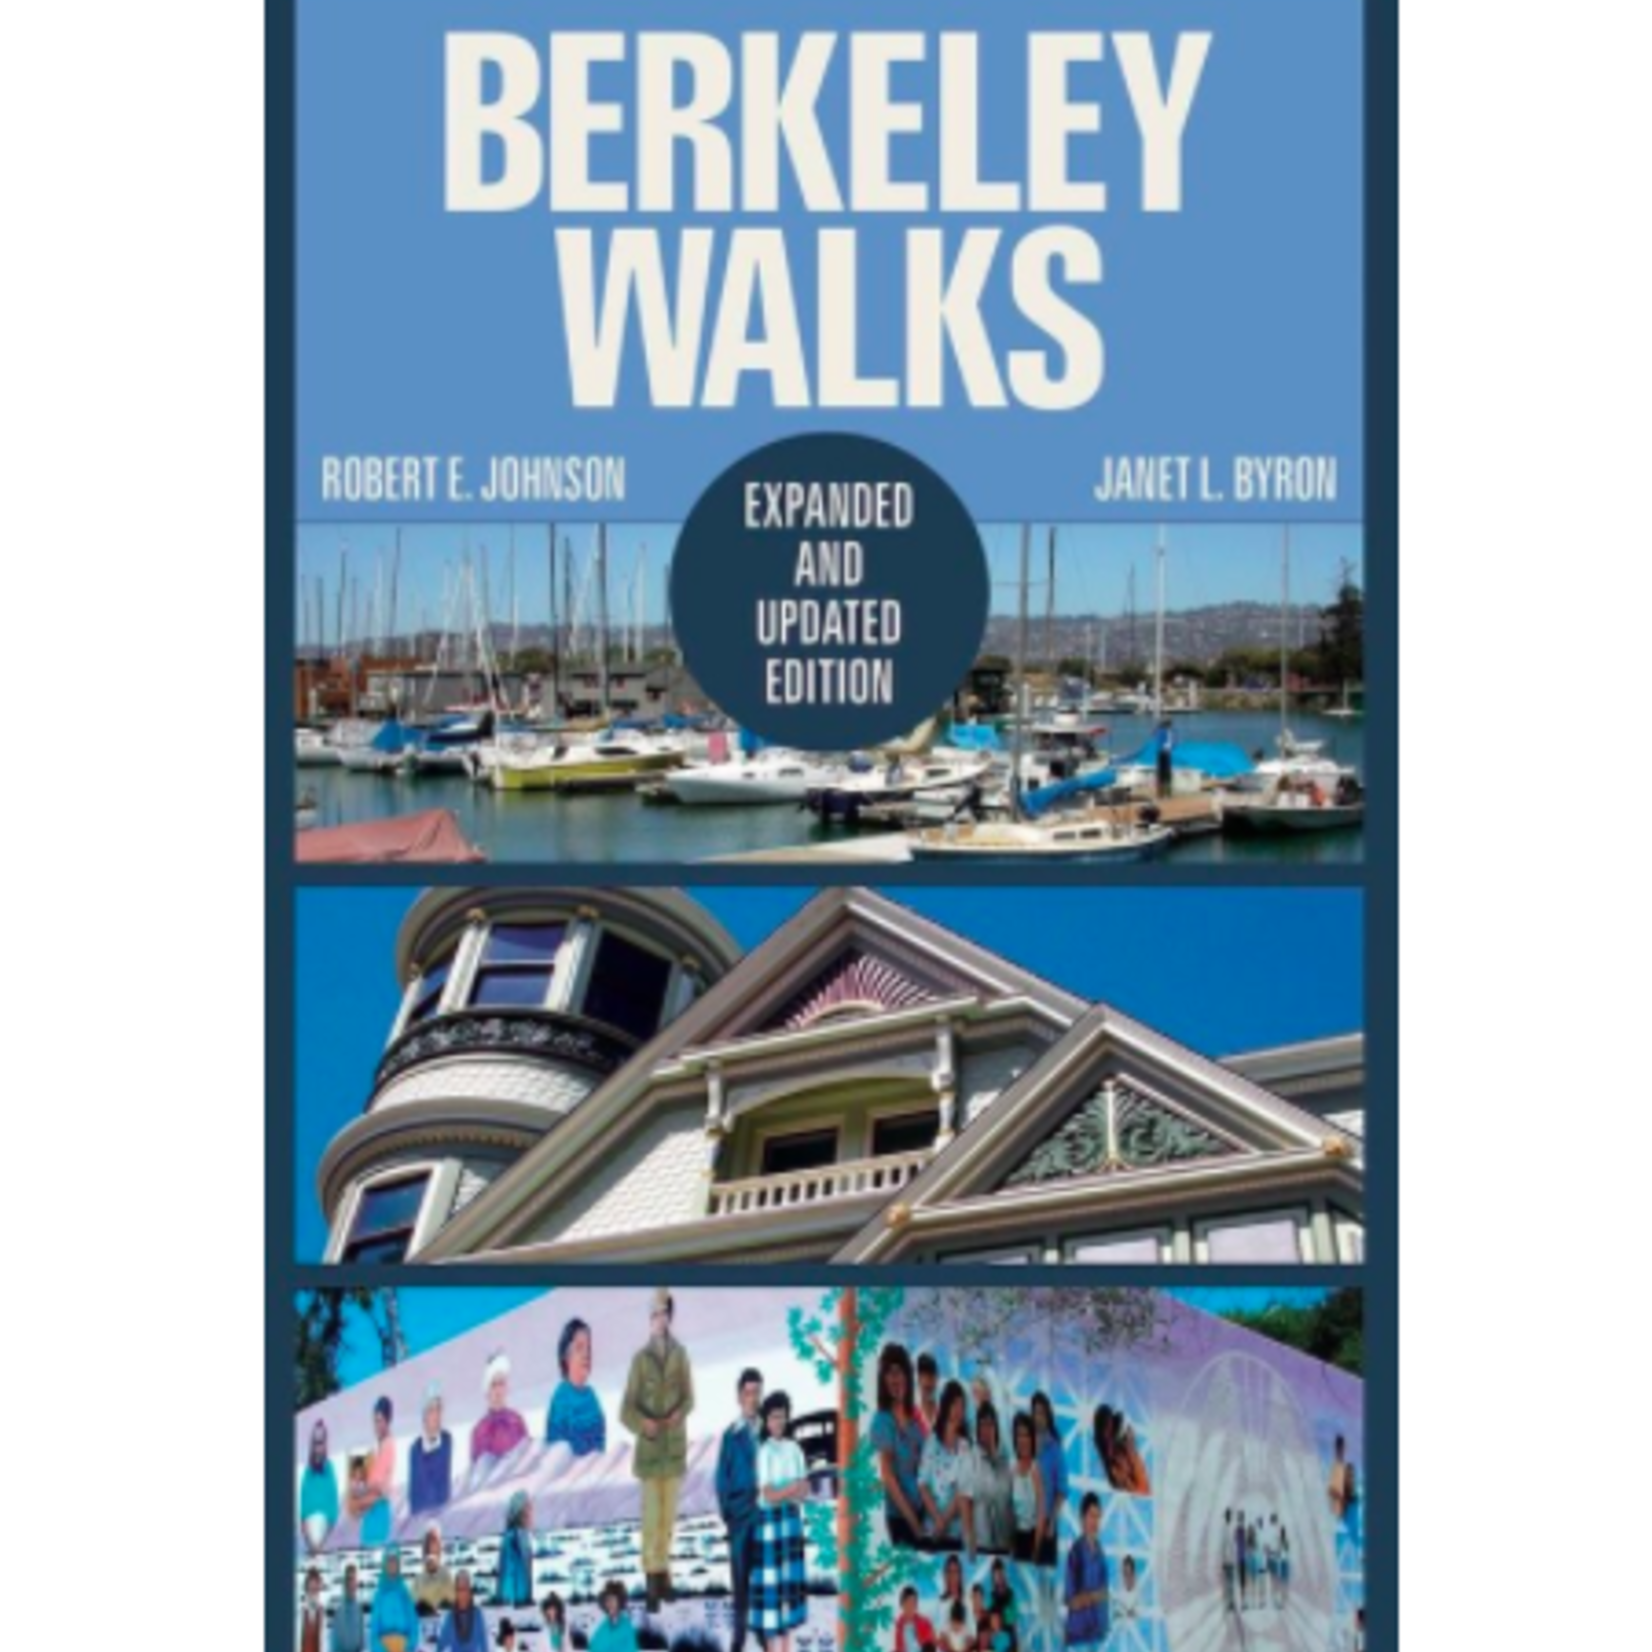 Berkeley Walks, 2nd edition